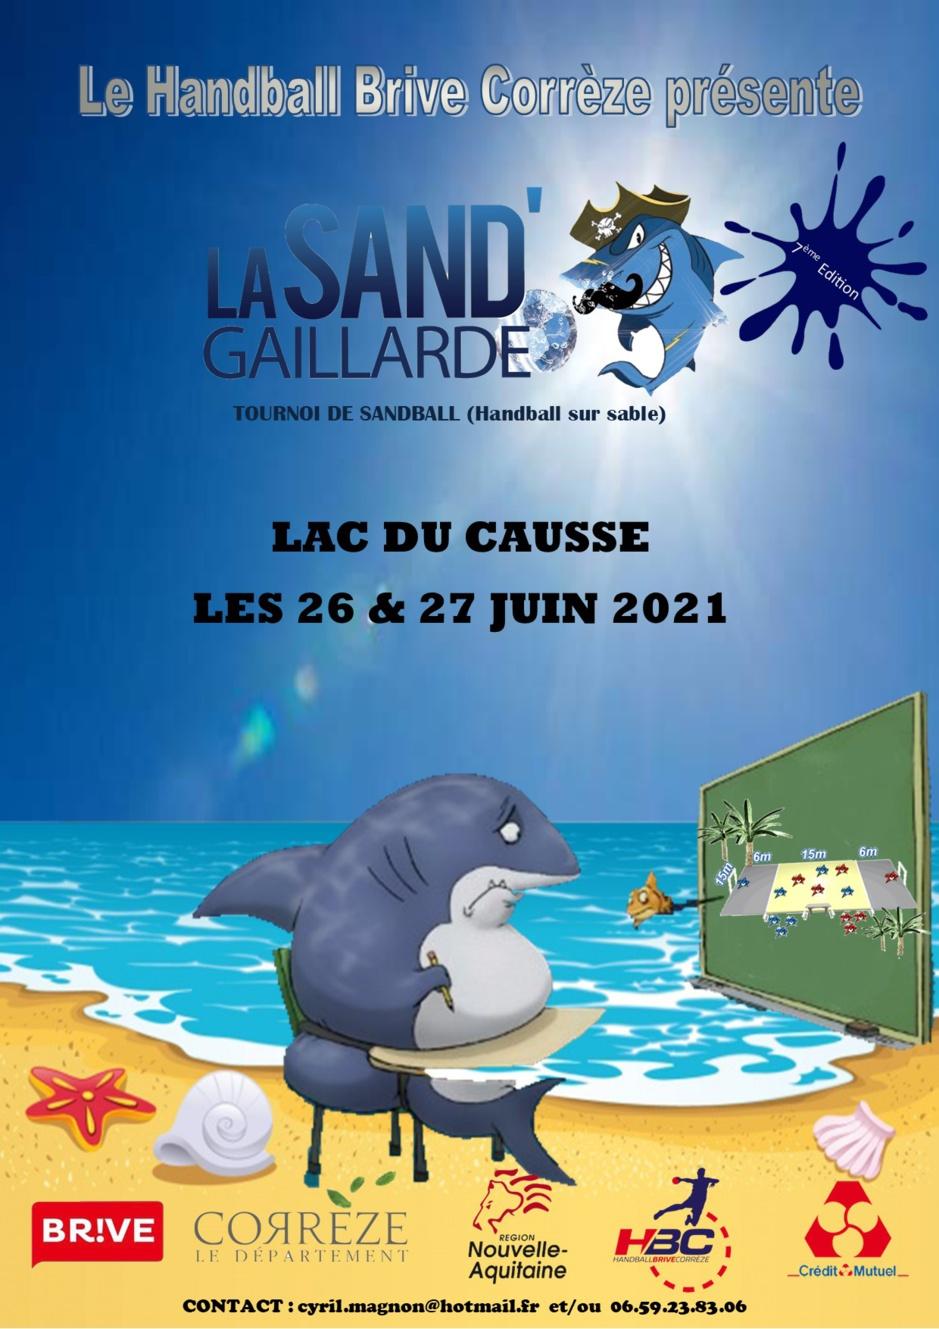 La Sand'Gaillarde 2021